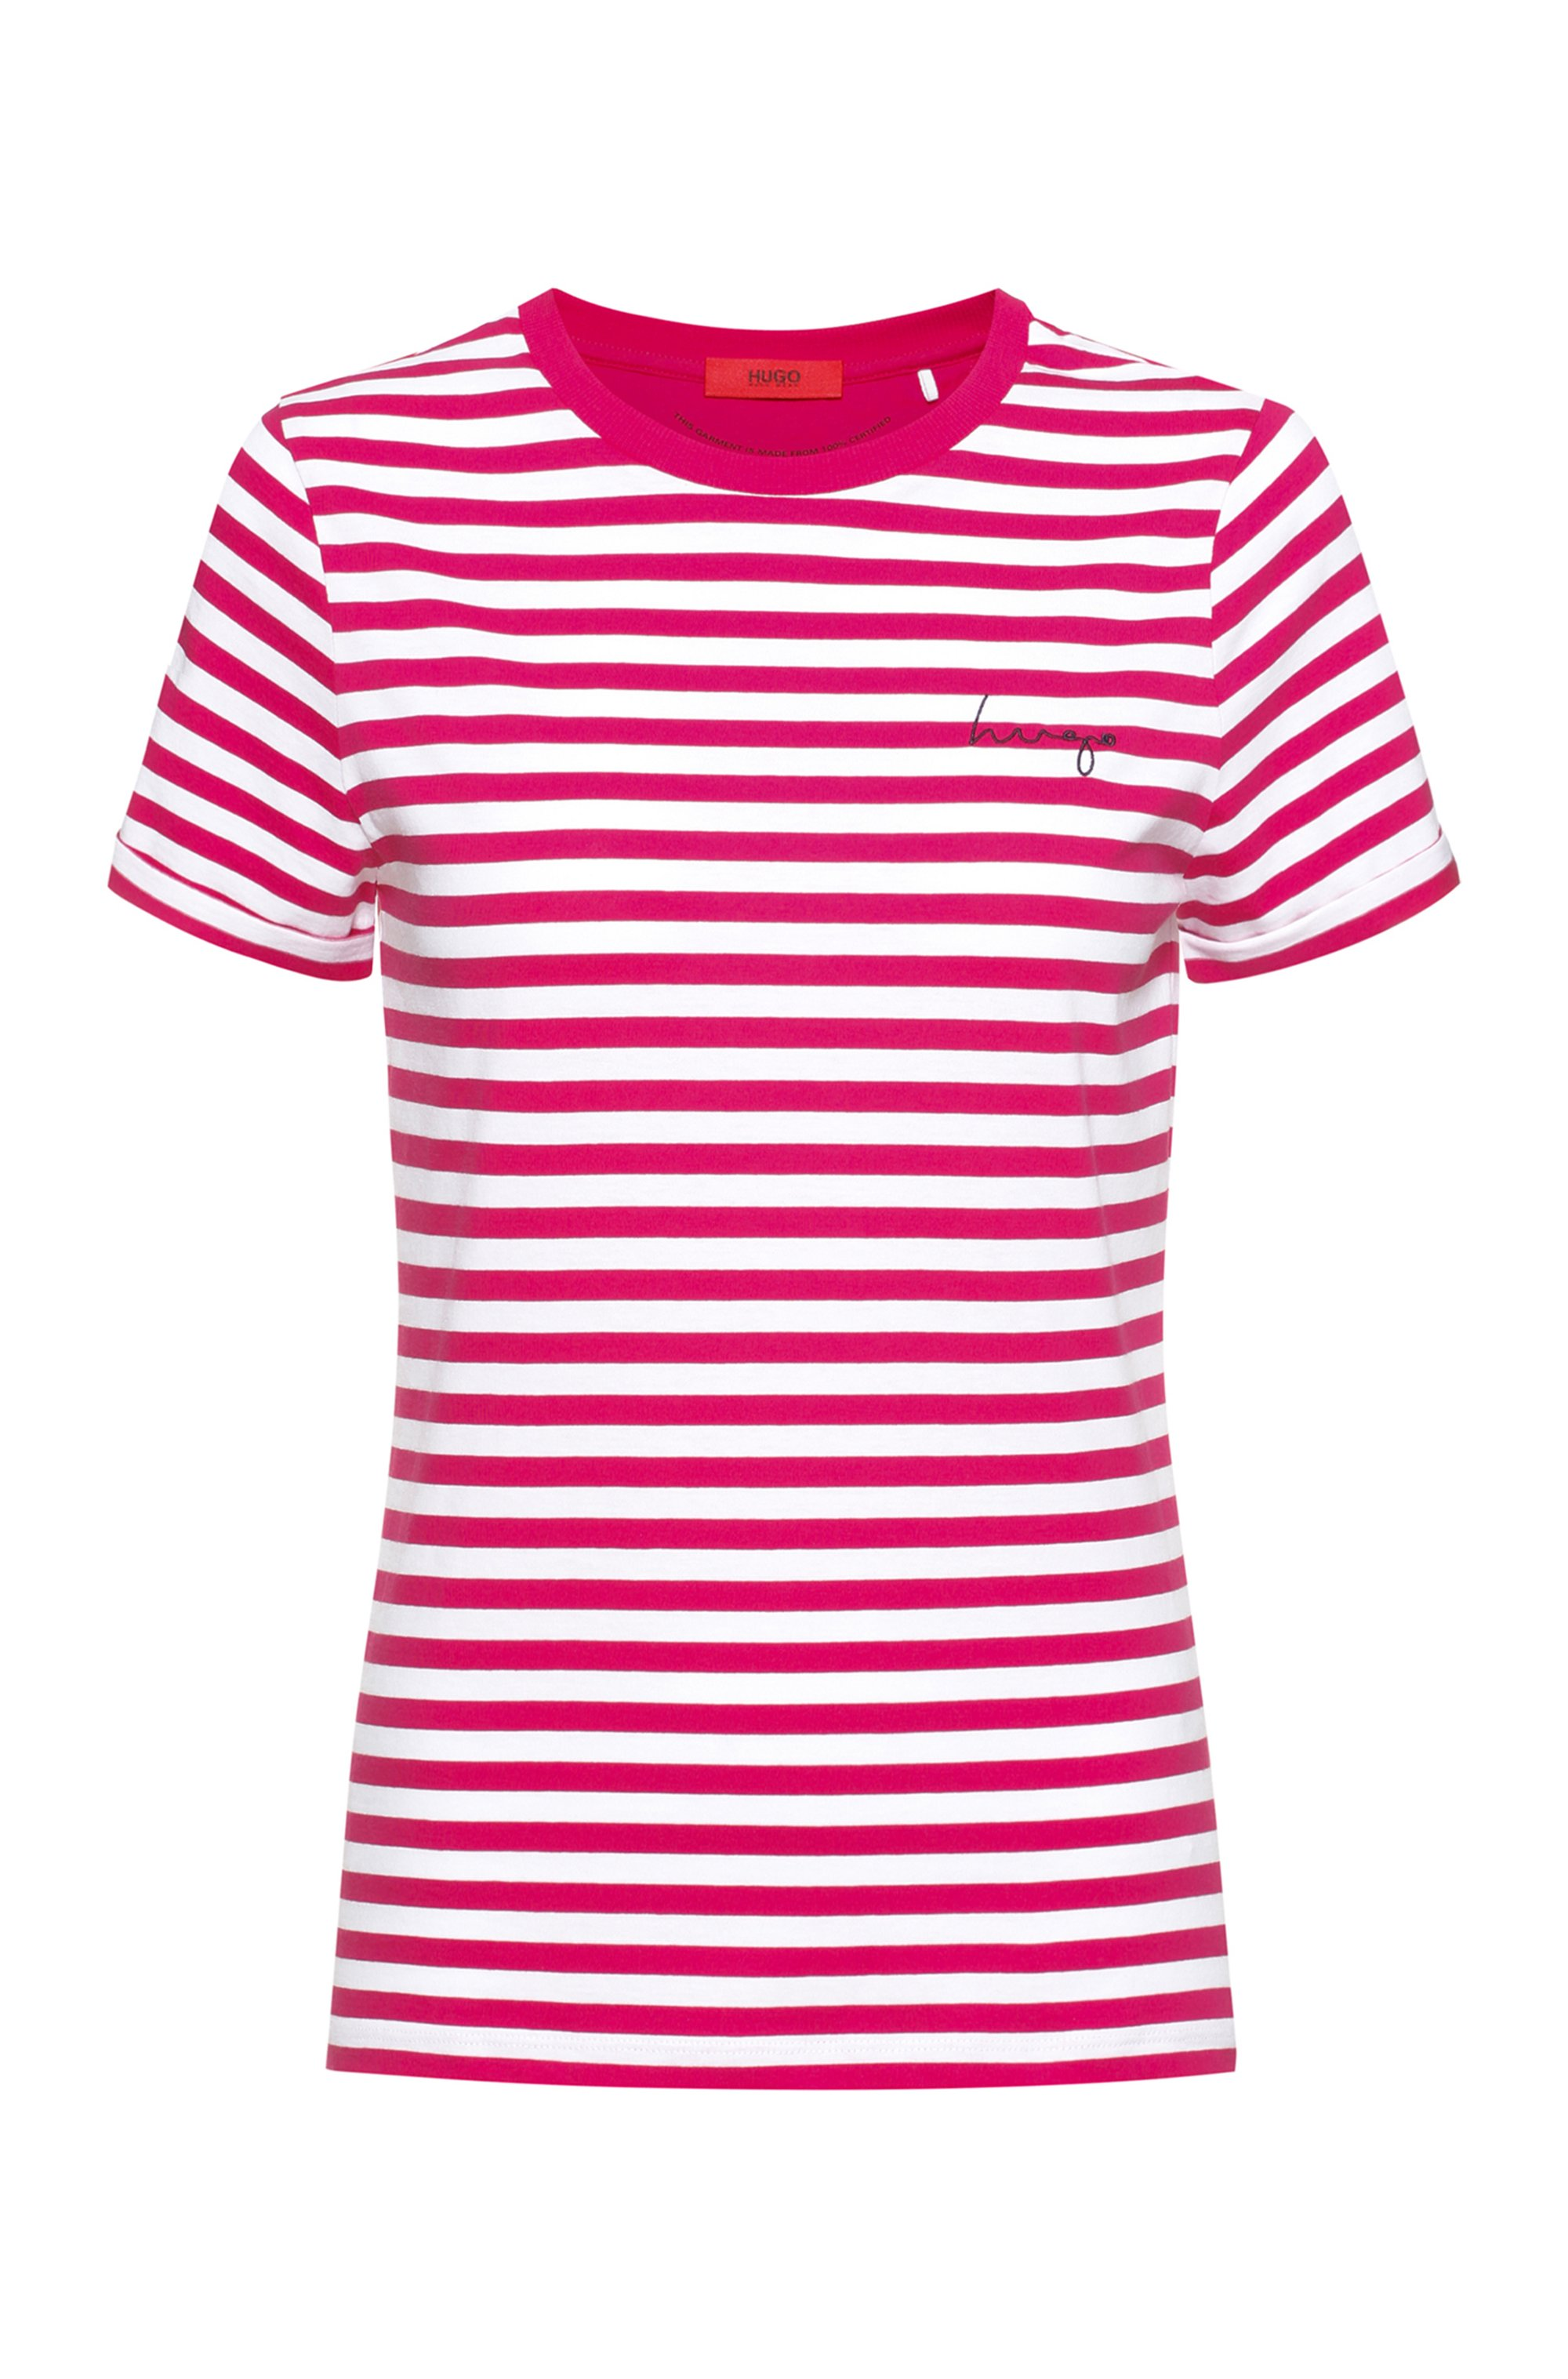 Gestreiftes Slim-Fit T-Shirt aus Bio-Baumwoll-Jersey, Rosa gemustert